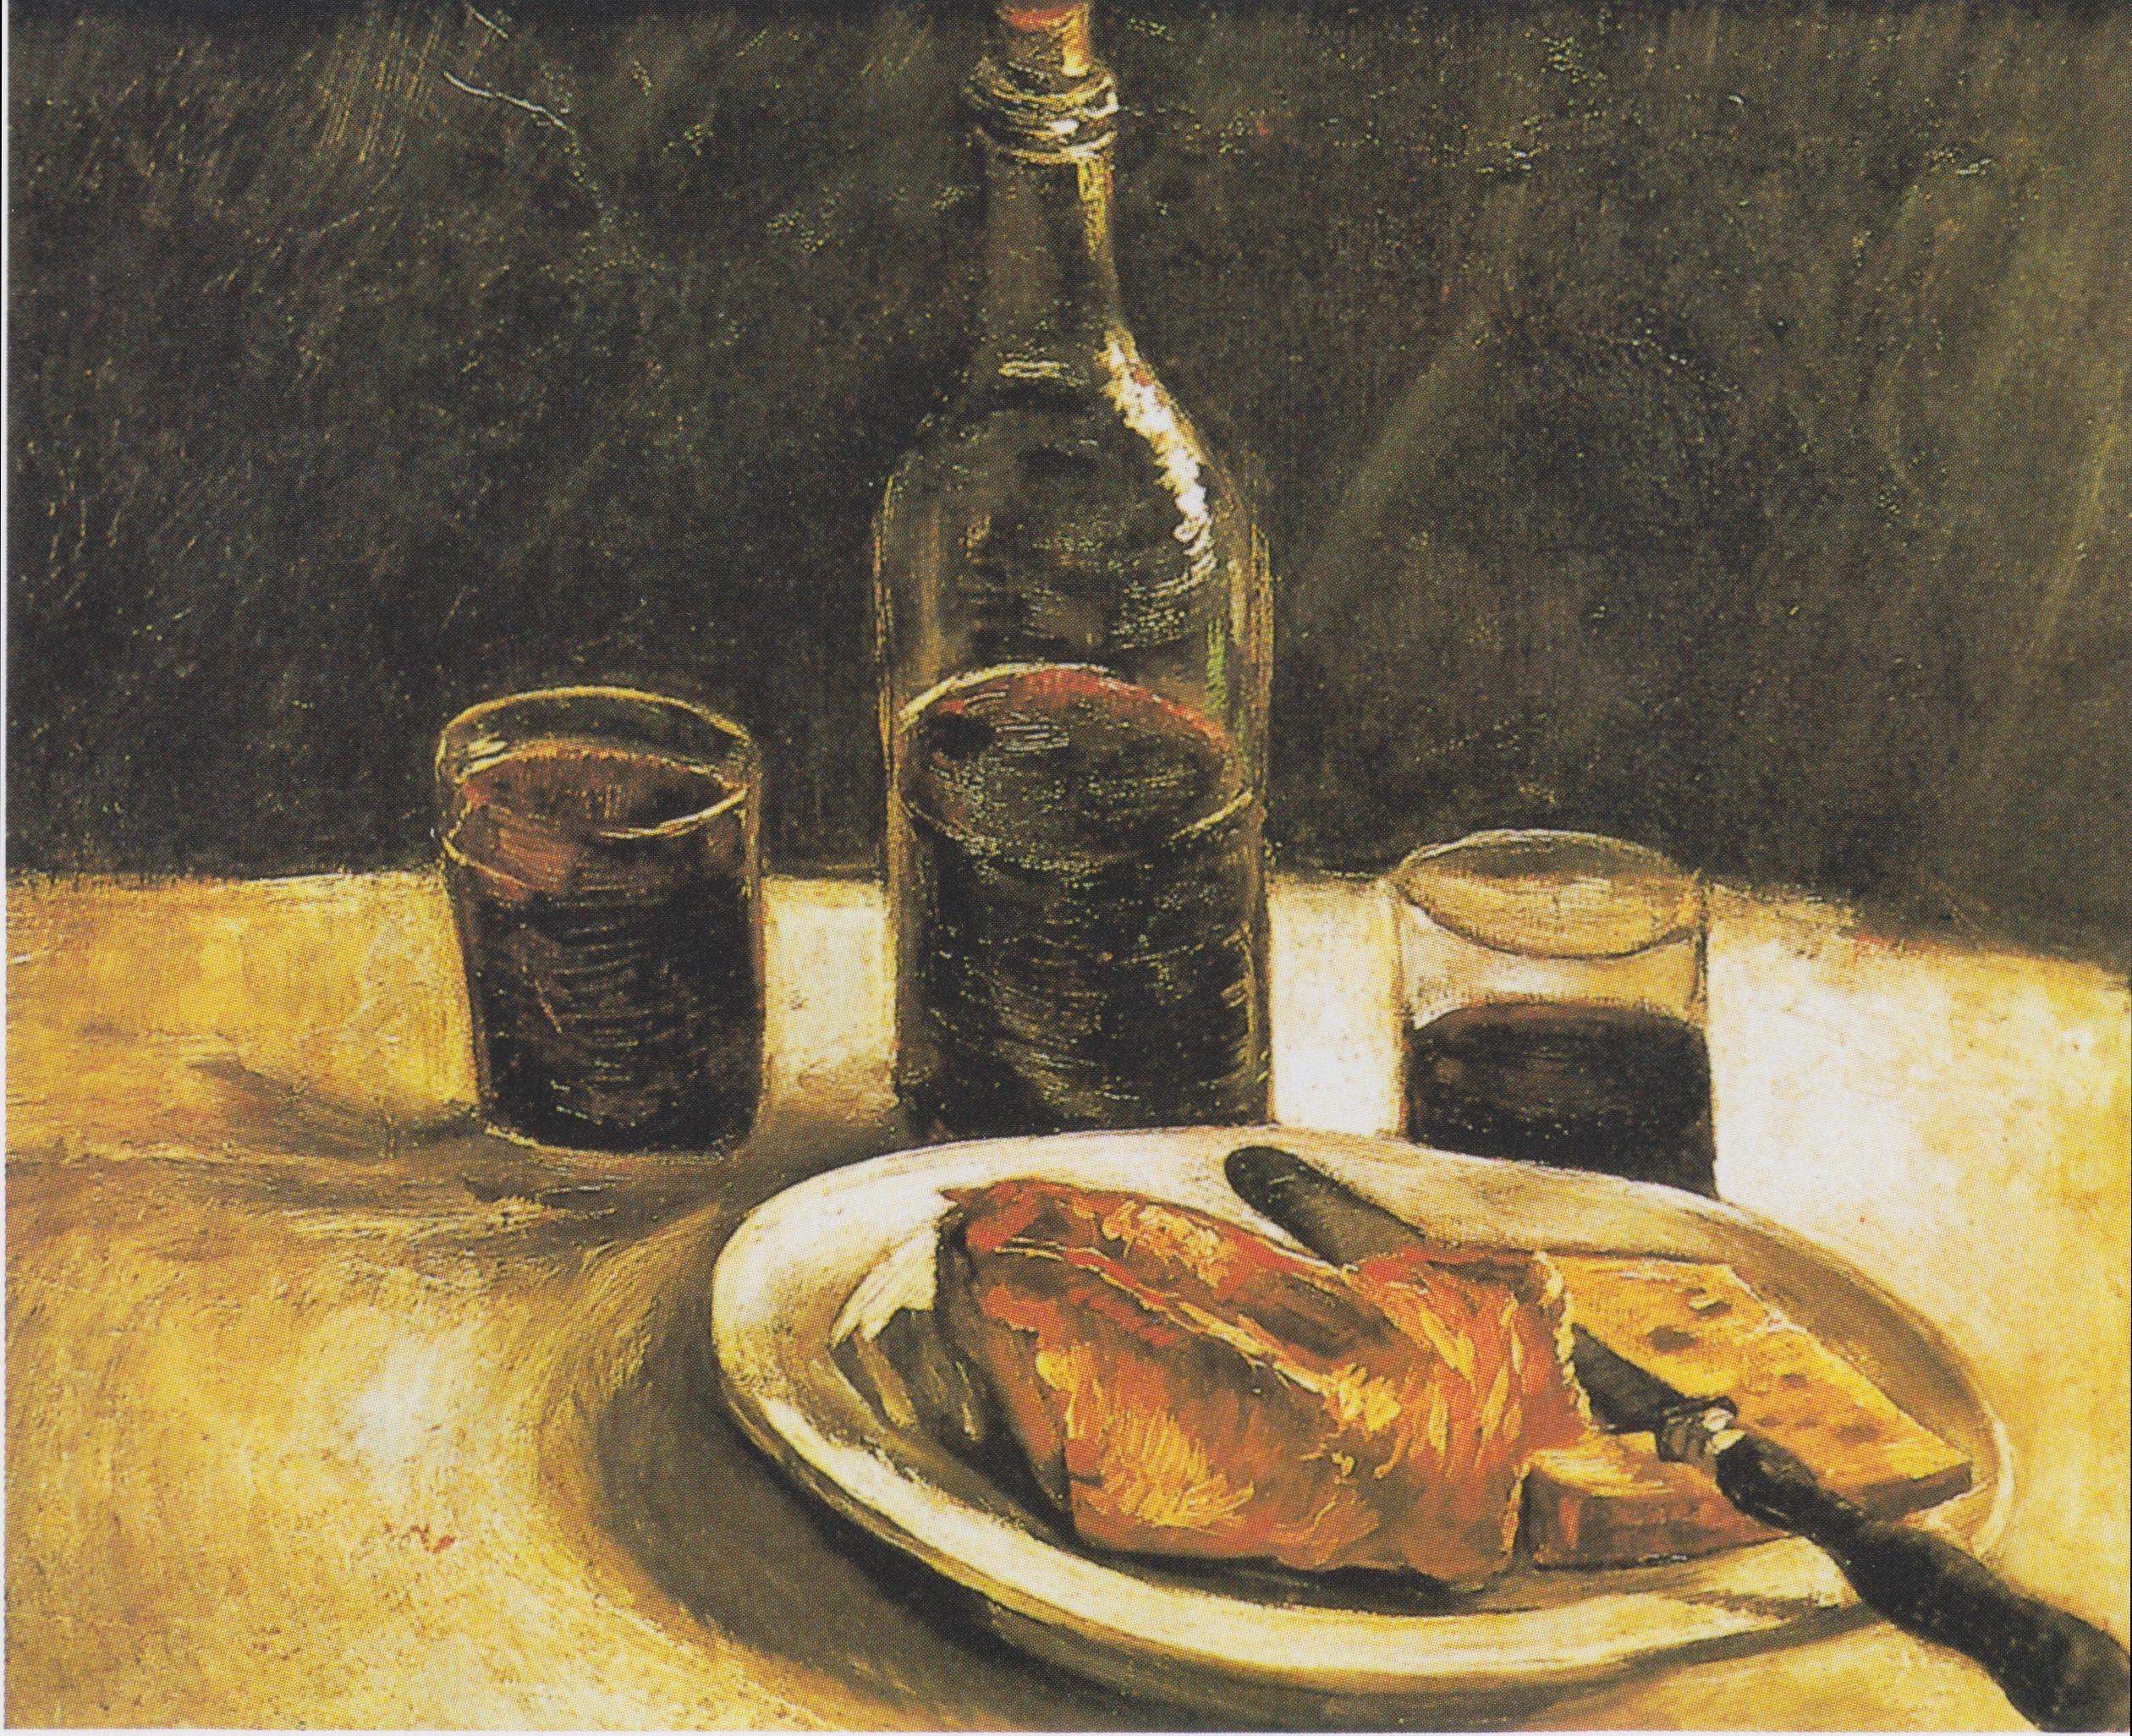 Van Gogh Drink Recipes